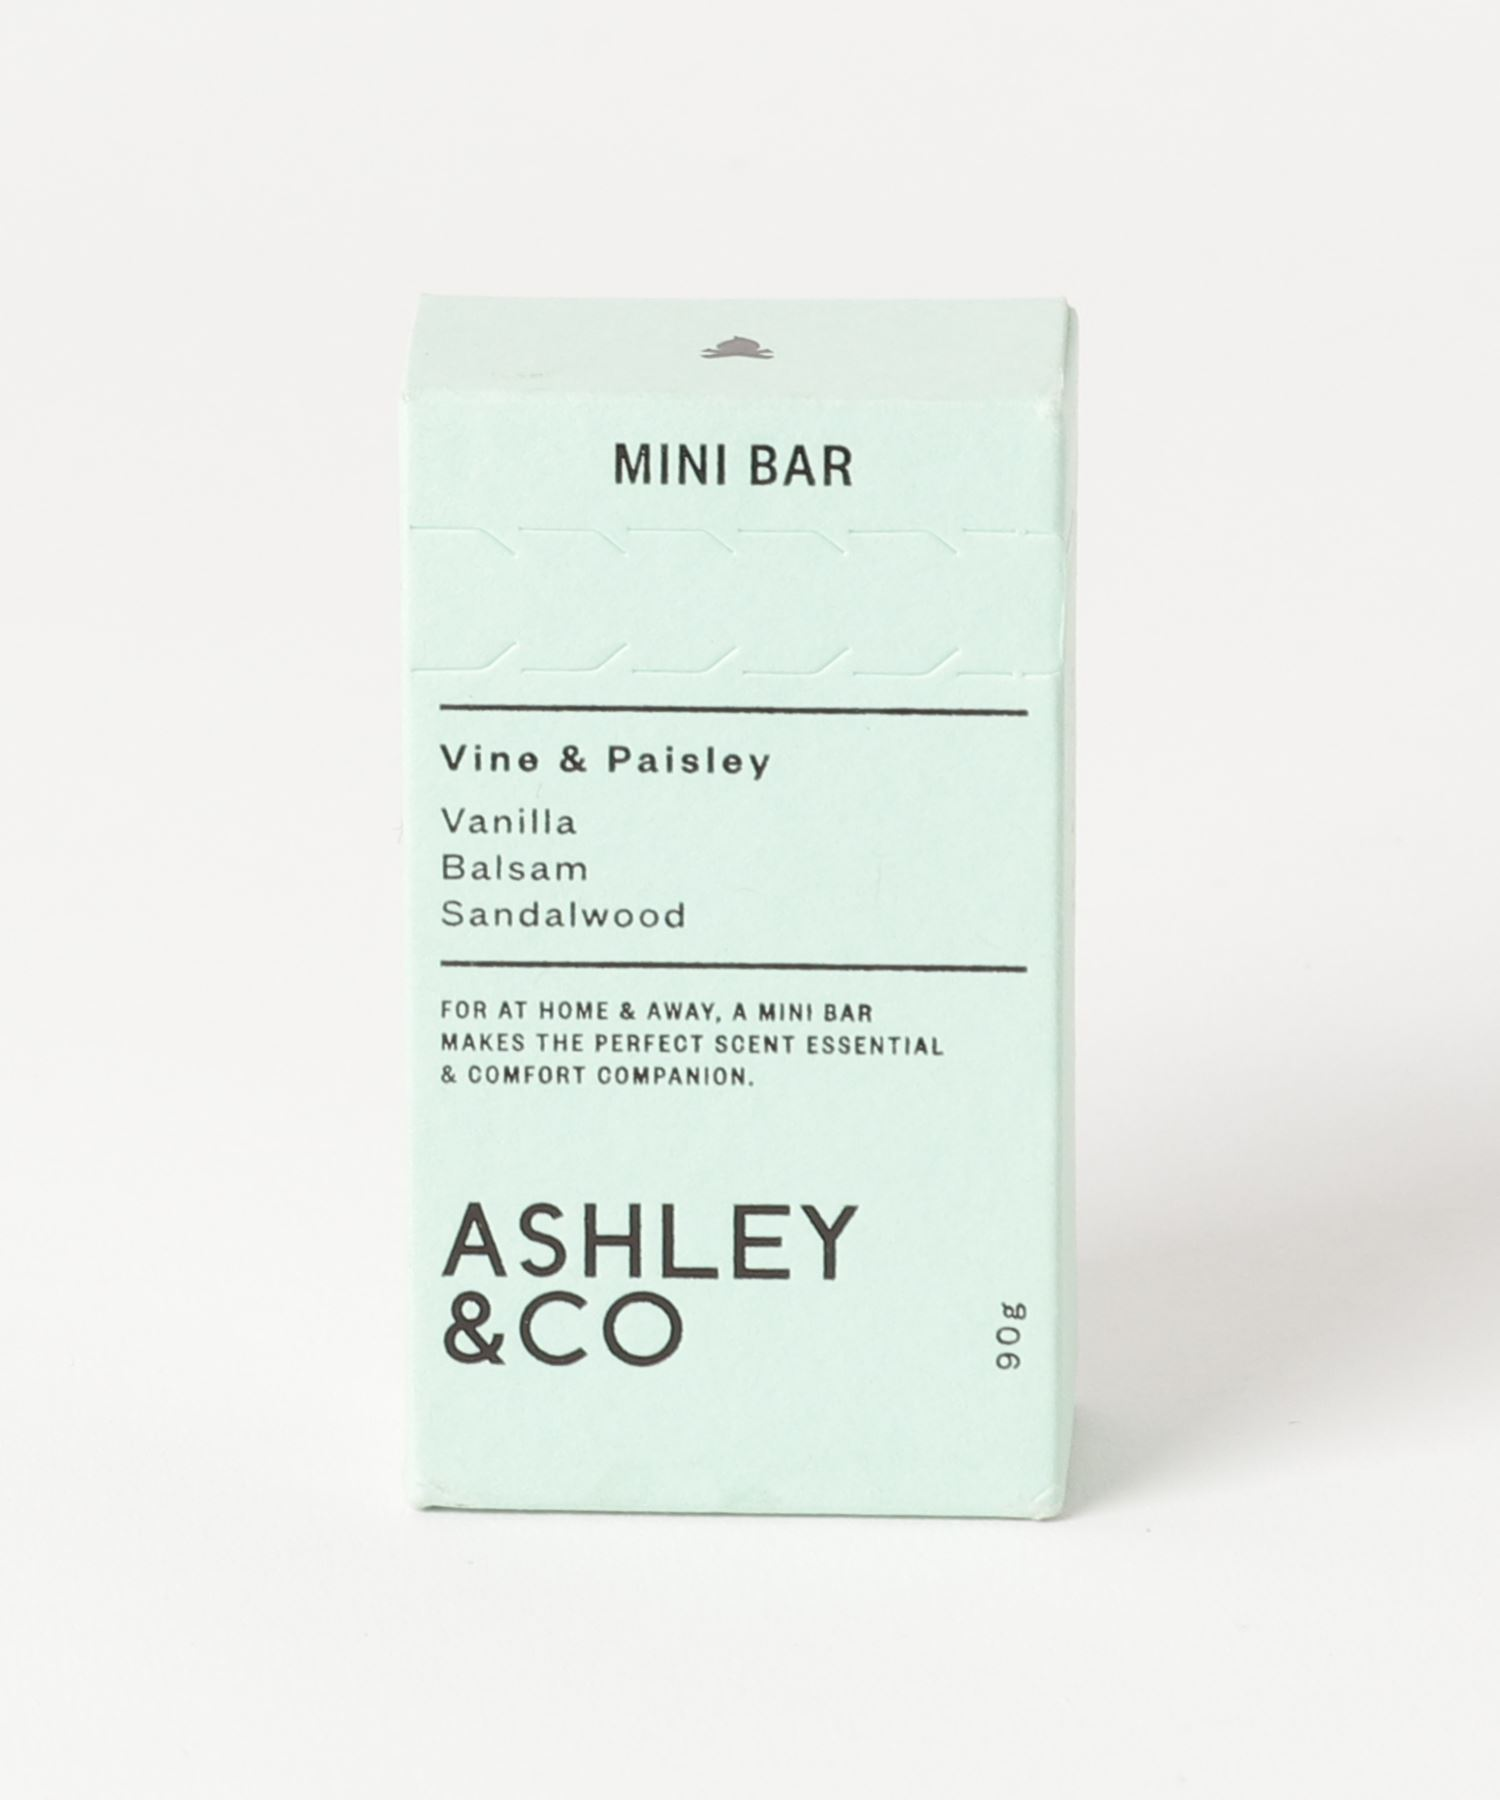 ASHLEY & CO ソープ Vine & Paisley 90g